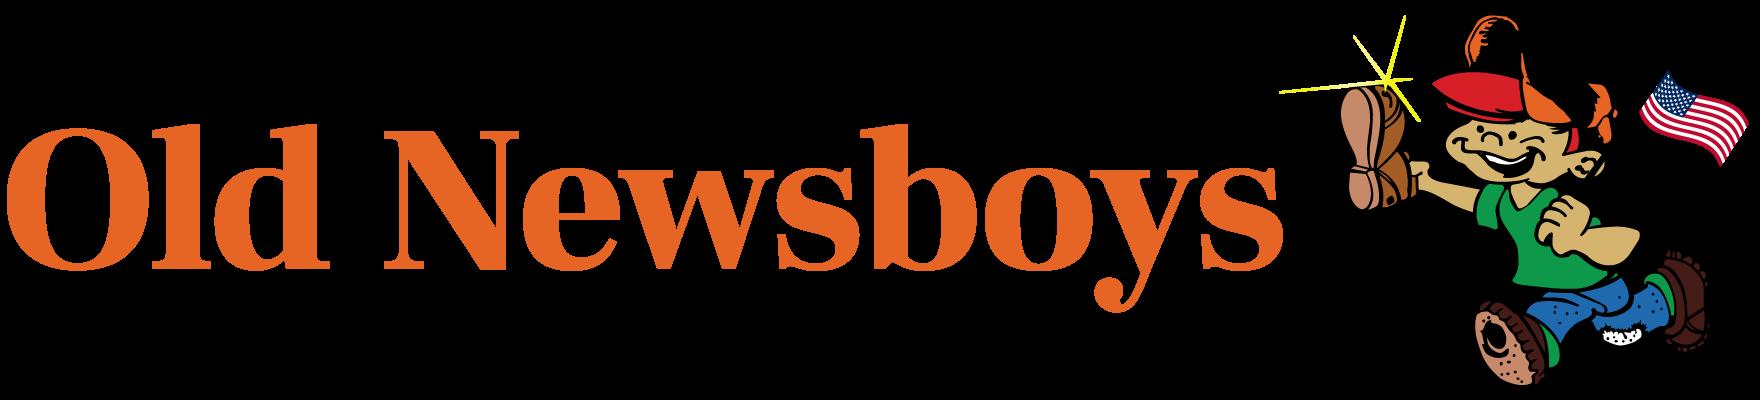 Old Newsboys logo